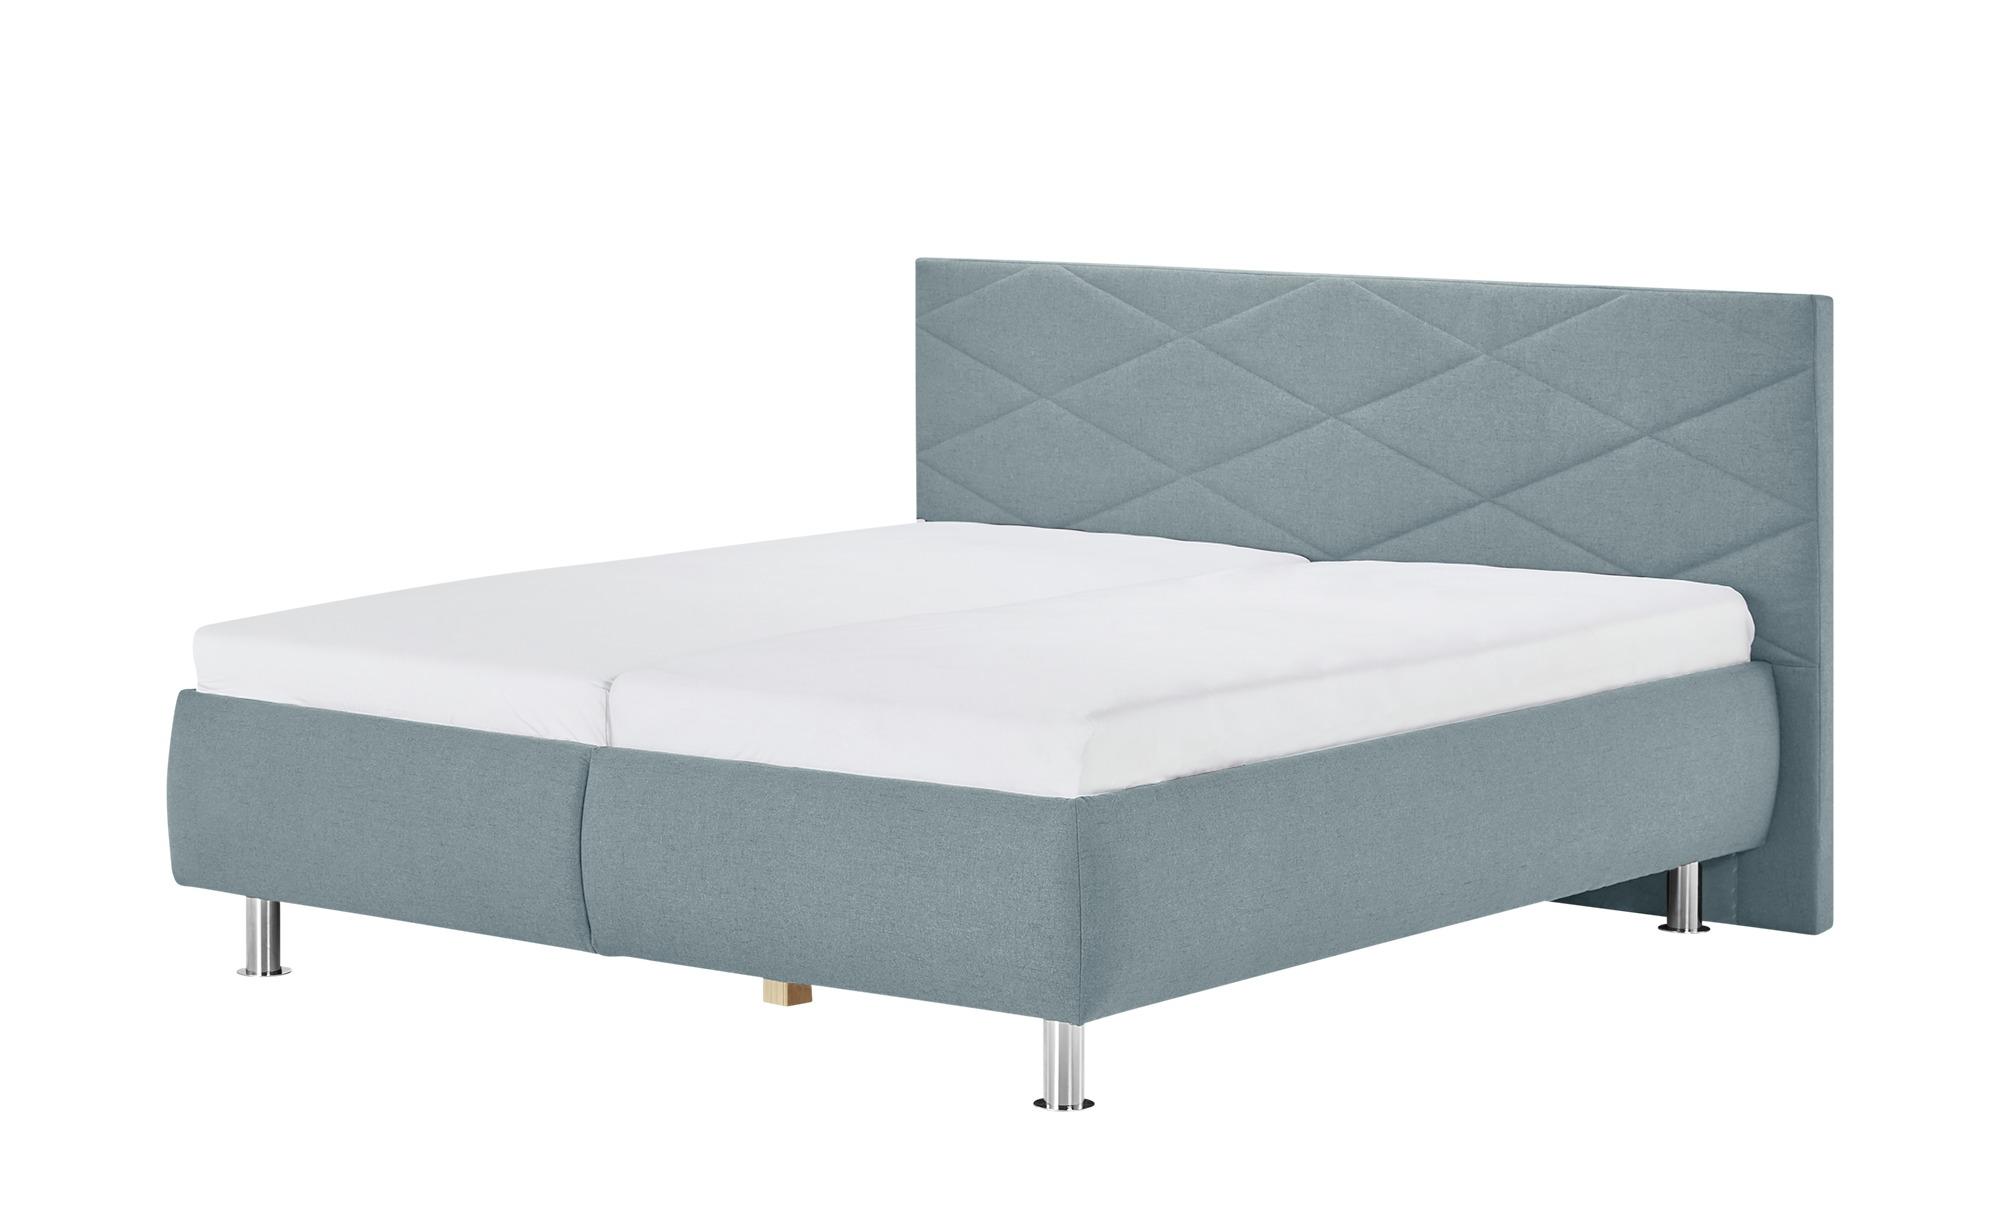 Polsterbett  Kos ¦ blau ¦ Maße (cm): B: 180 H: 112 Betten > Polsterbetten - Höffner